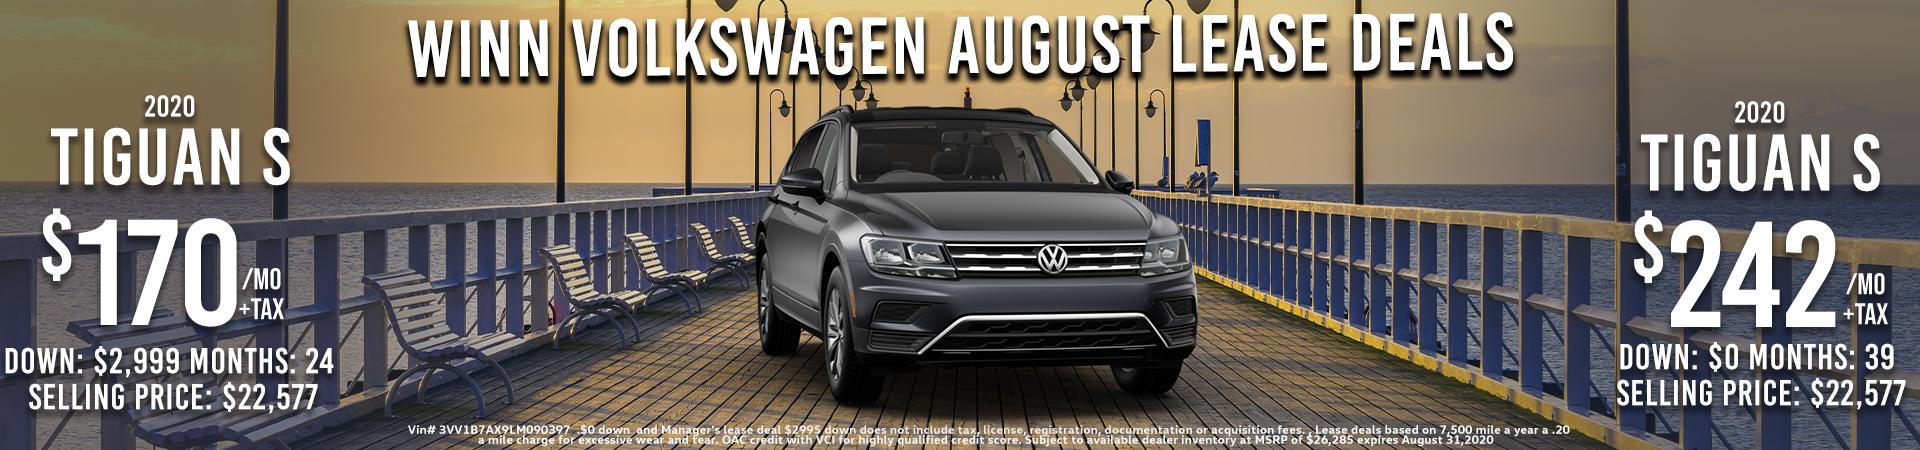 VW August JeTiguan Lease deals, Fremont, Milpitas, Union City, San Jose, Santa Clara, Stevens Creek, Sunnyvale, San Leandro , Hayward, Redwood City, Mountainview, , Bay area